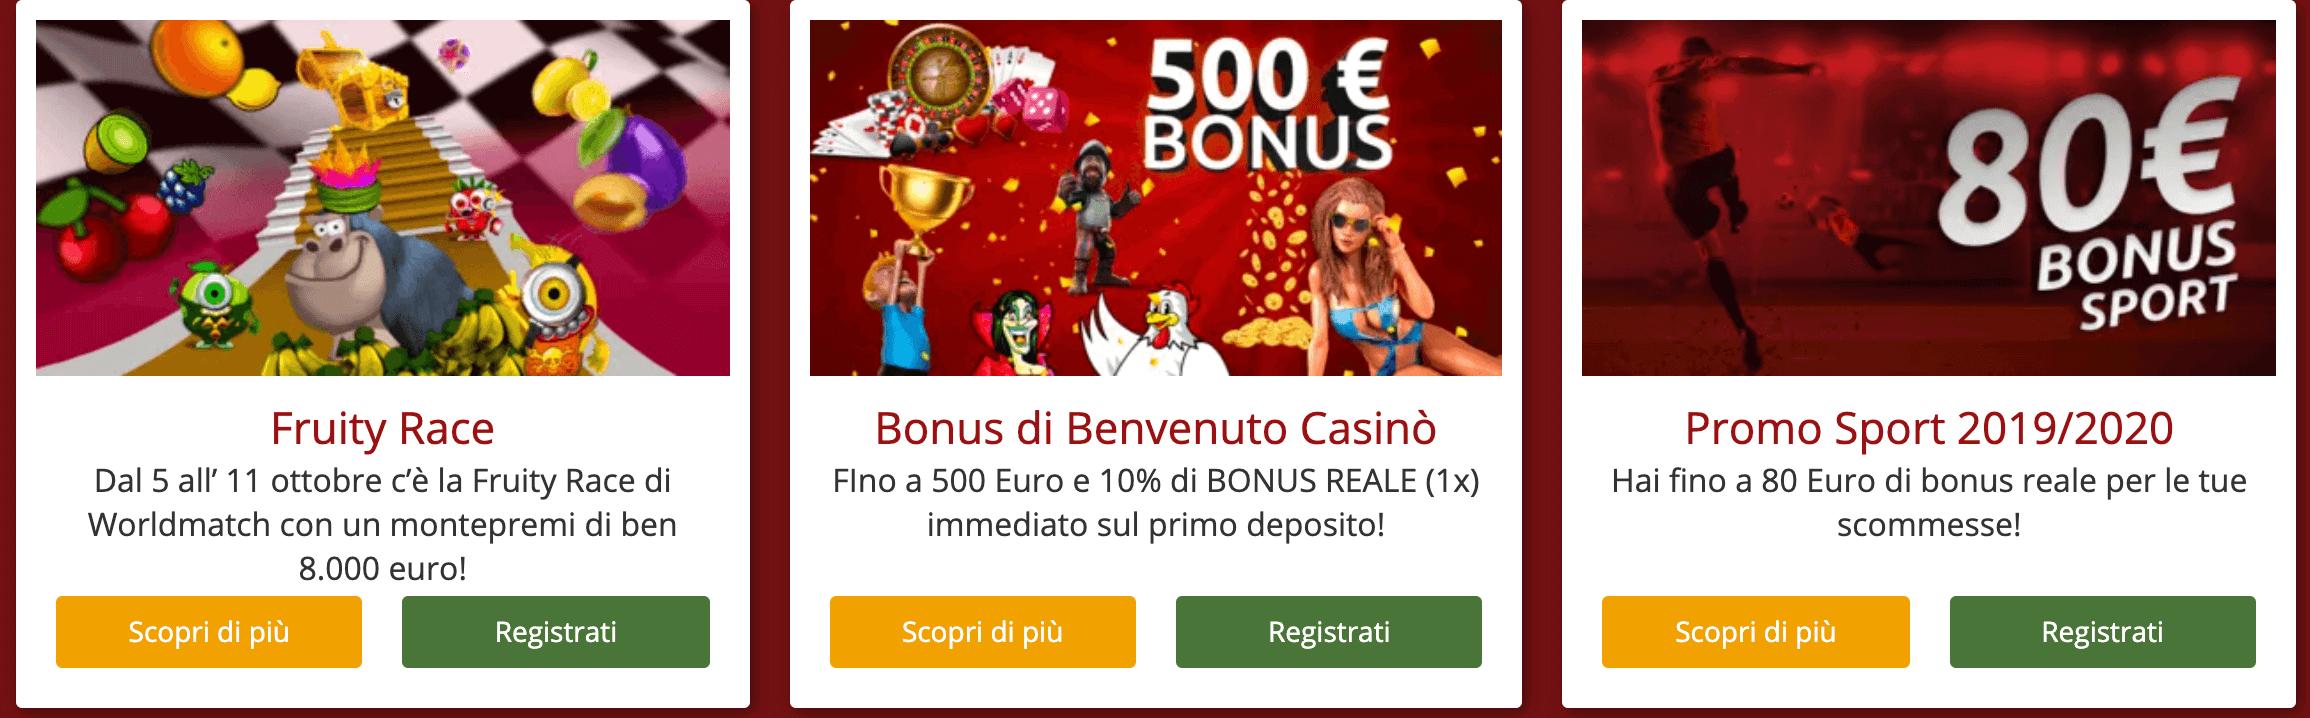 merkurwin casino bonus ottobre